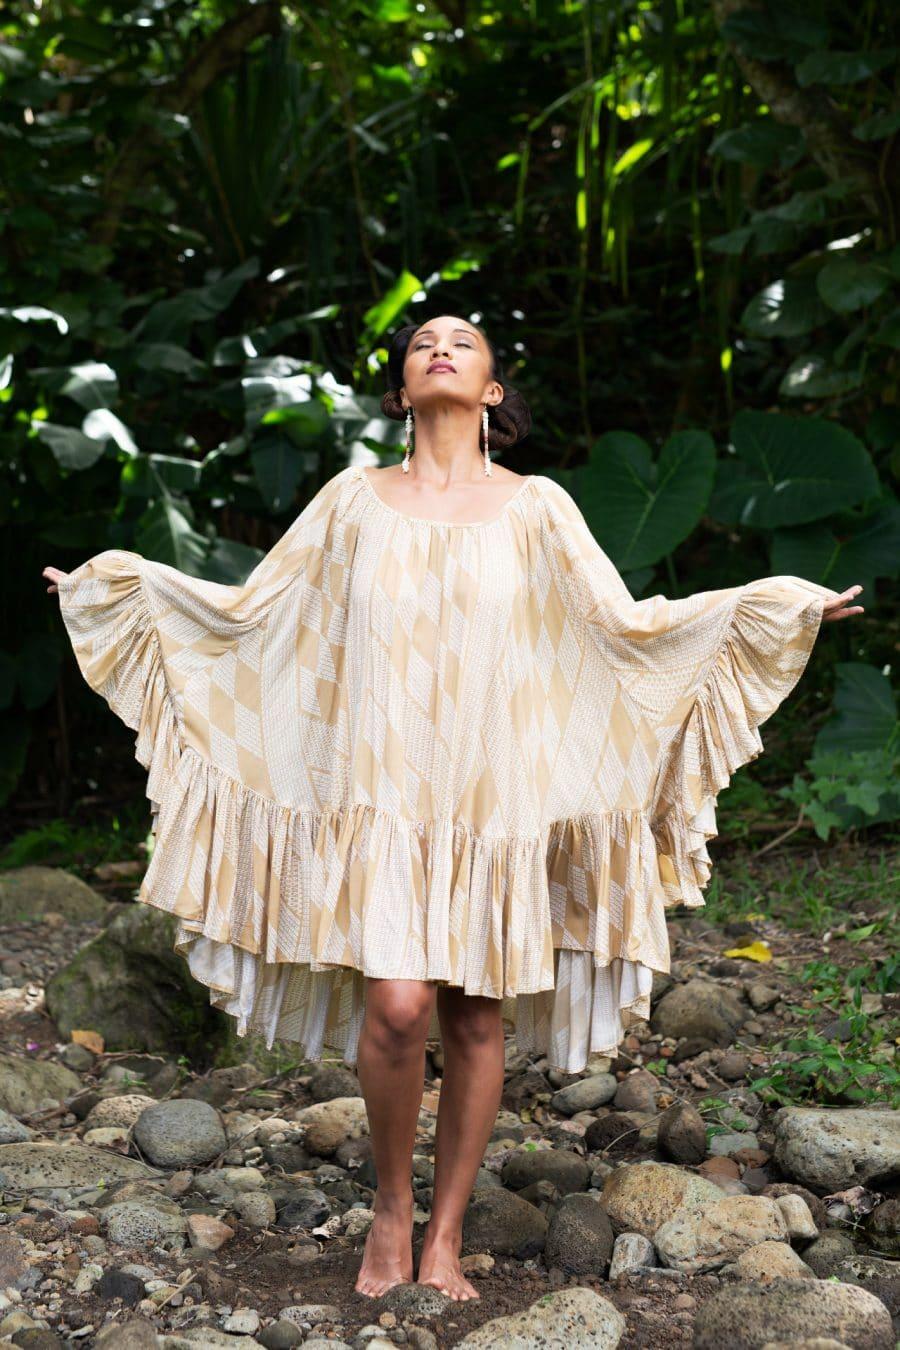 Model wearing Loulu Top in Tannin/Moonbeam - Front View